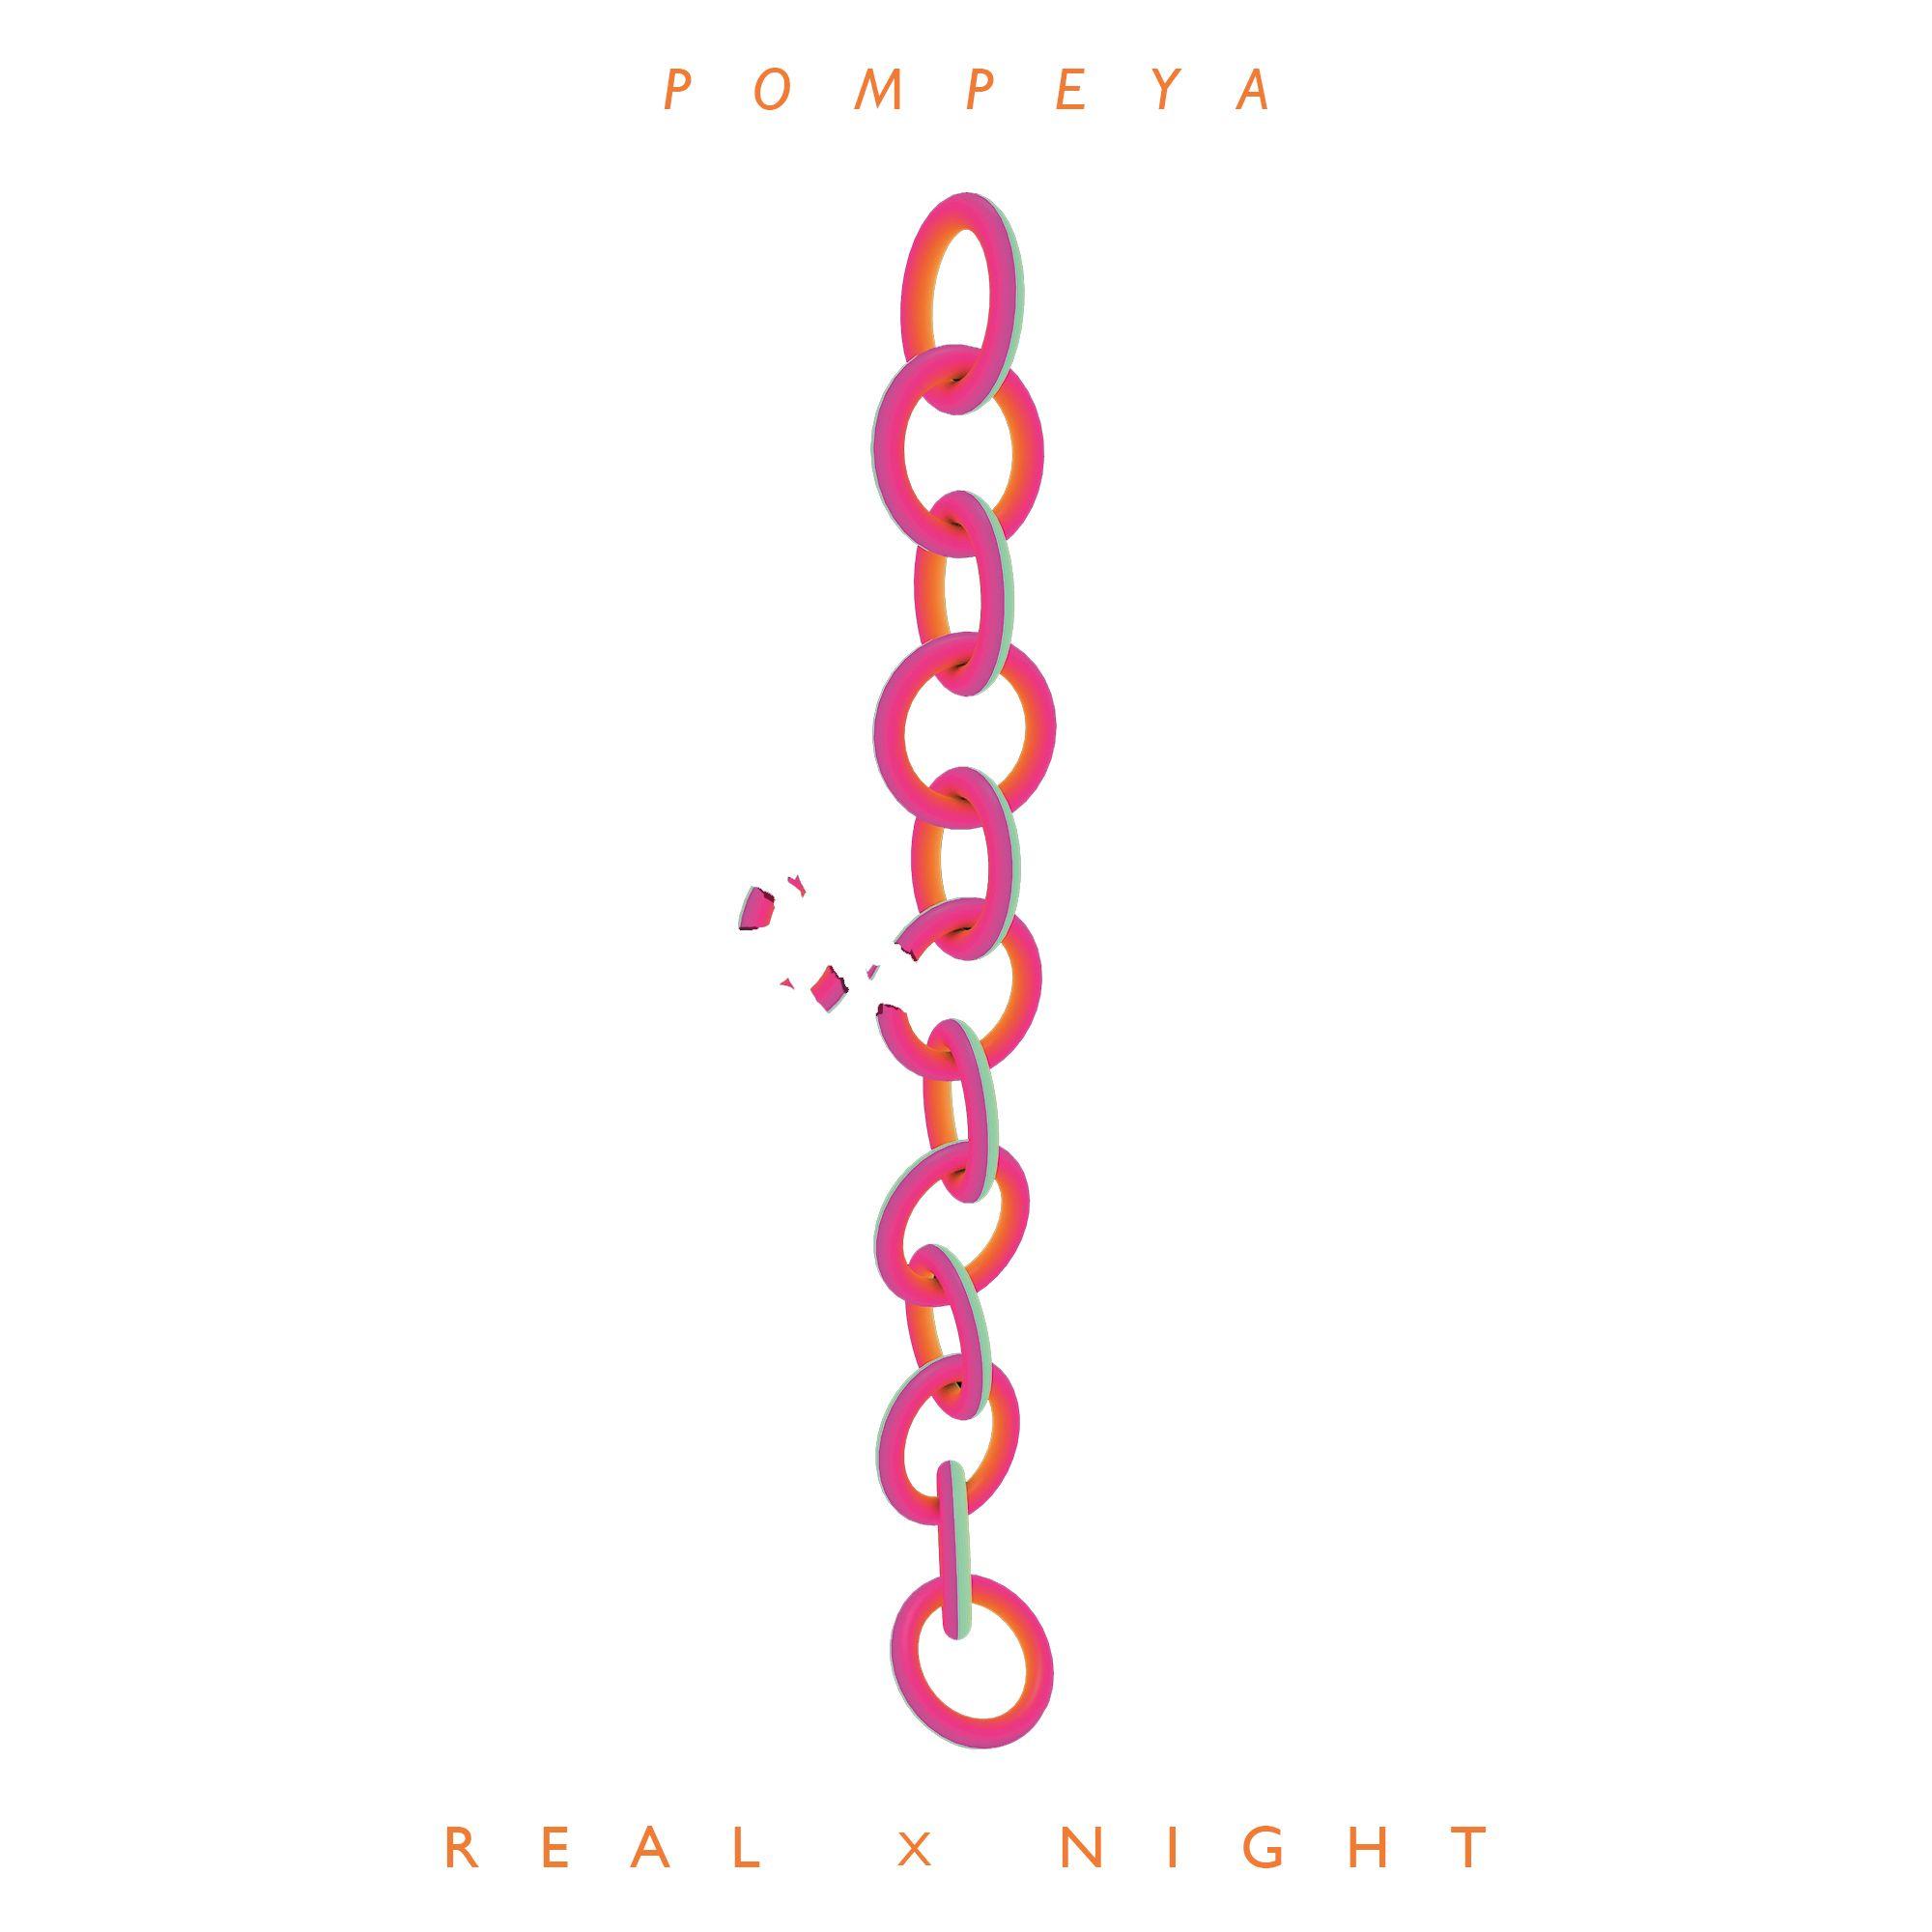 Pompeya - OOOOO (Cry About It) (Win & Woo Remix)